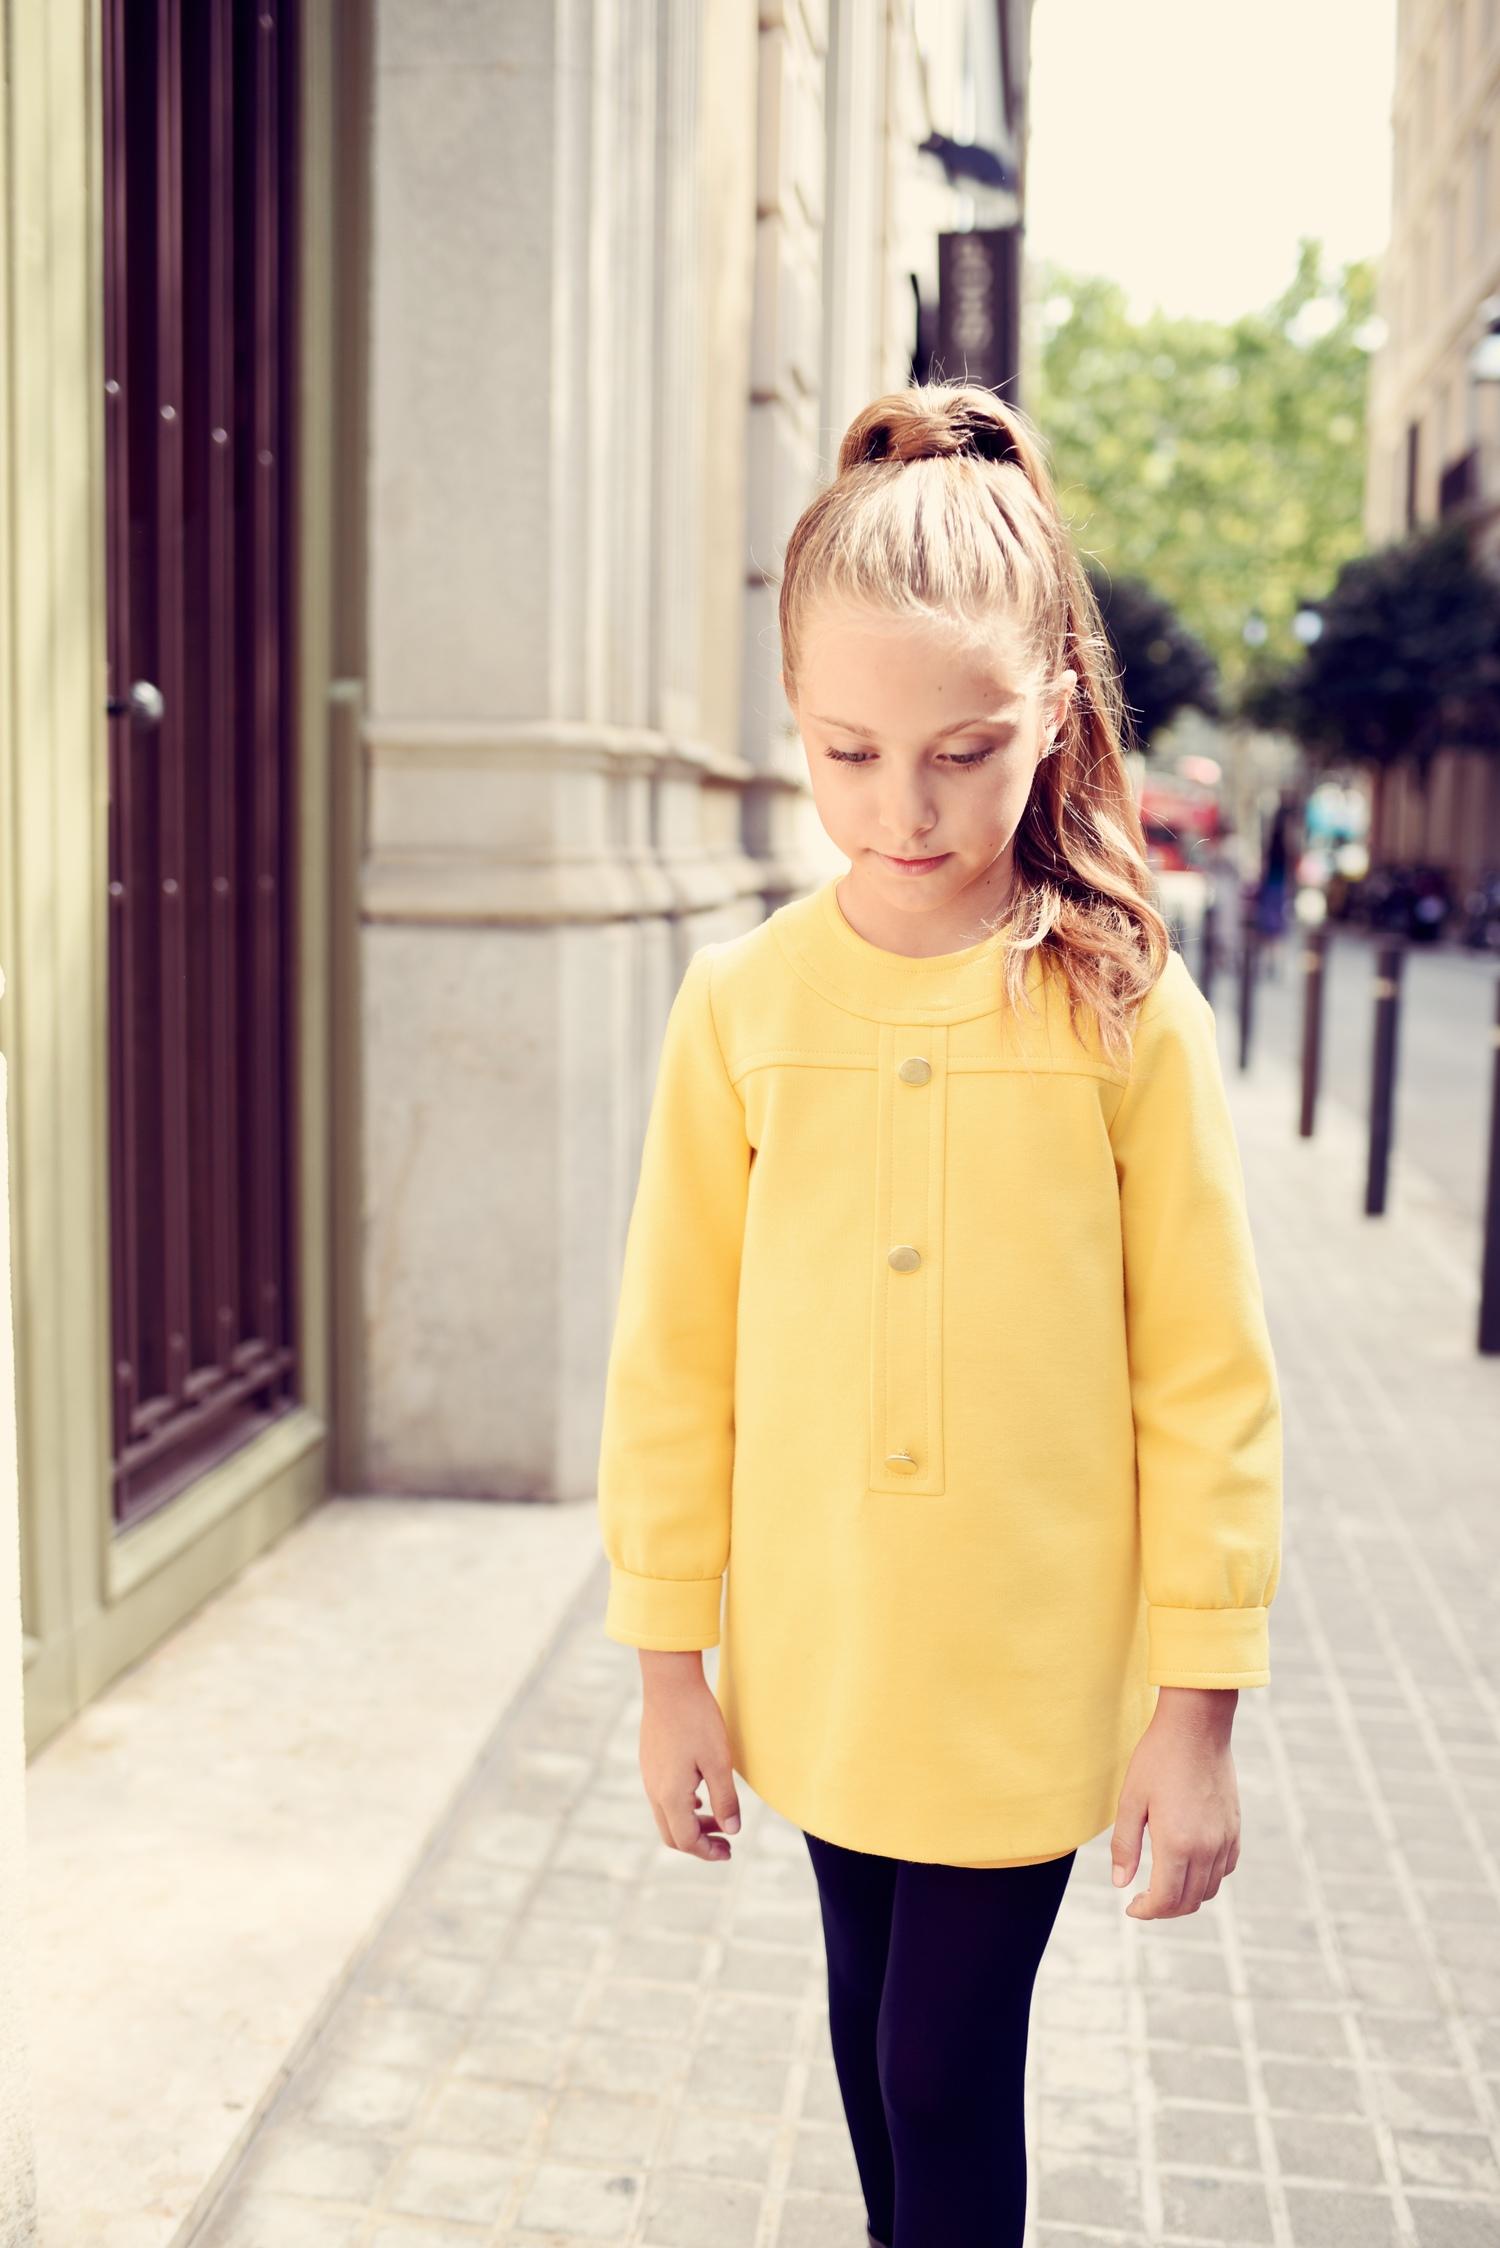 Enfant+Street+Style+by+Gina+Kim+Photography-13.jpeg